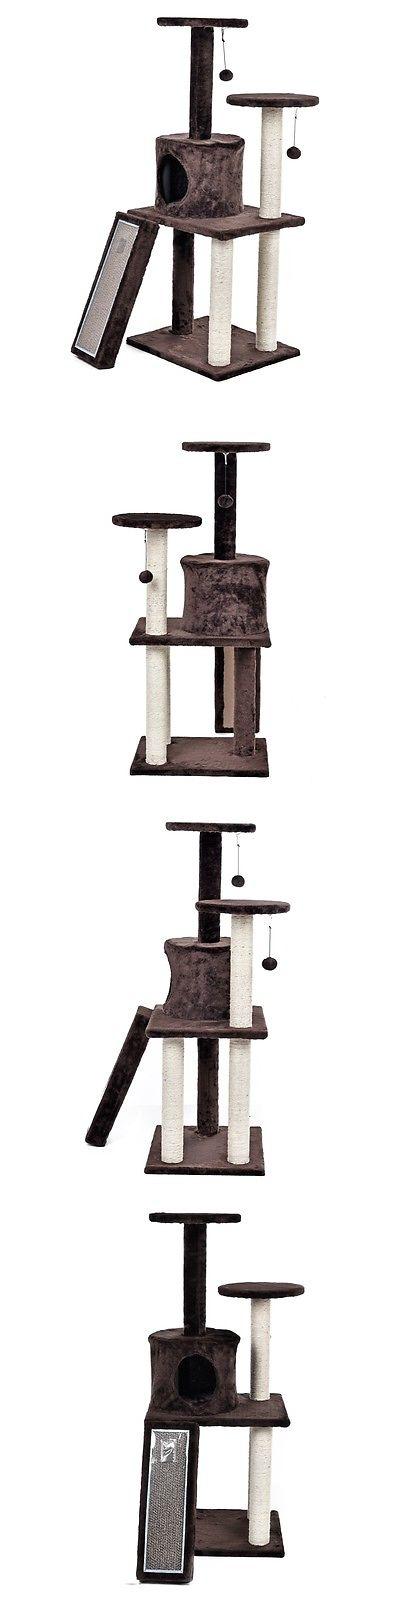 Animals Cats: 46u0027u0027 Pet Cat Playset Cat Tree Condo Furniture Scratching  Tower Kitten